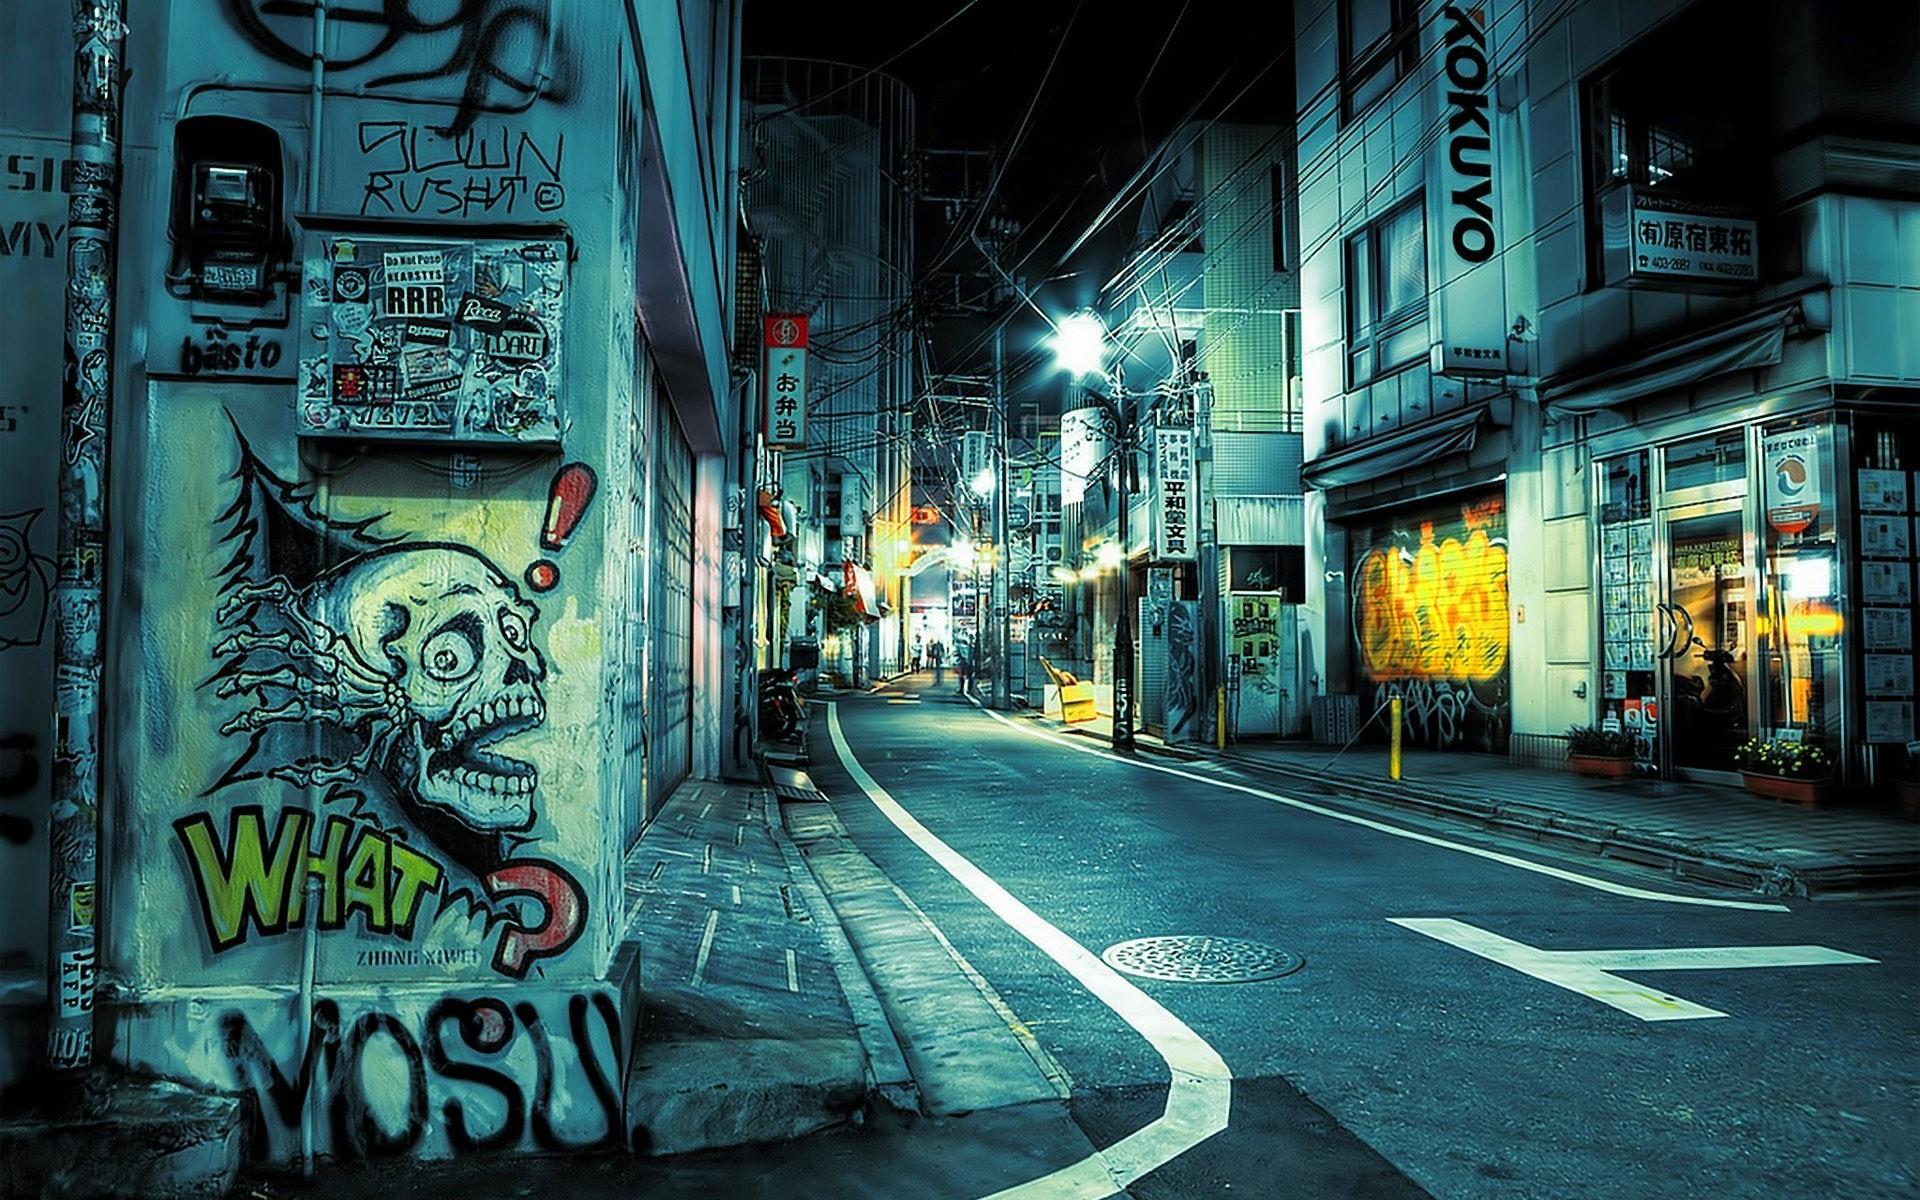 Wallpaper Hip Hop Girl Graffiti City Wallpapers Hd Free Download Pixelstalk Net